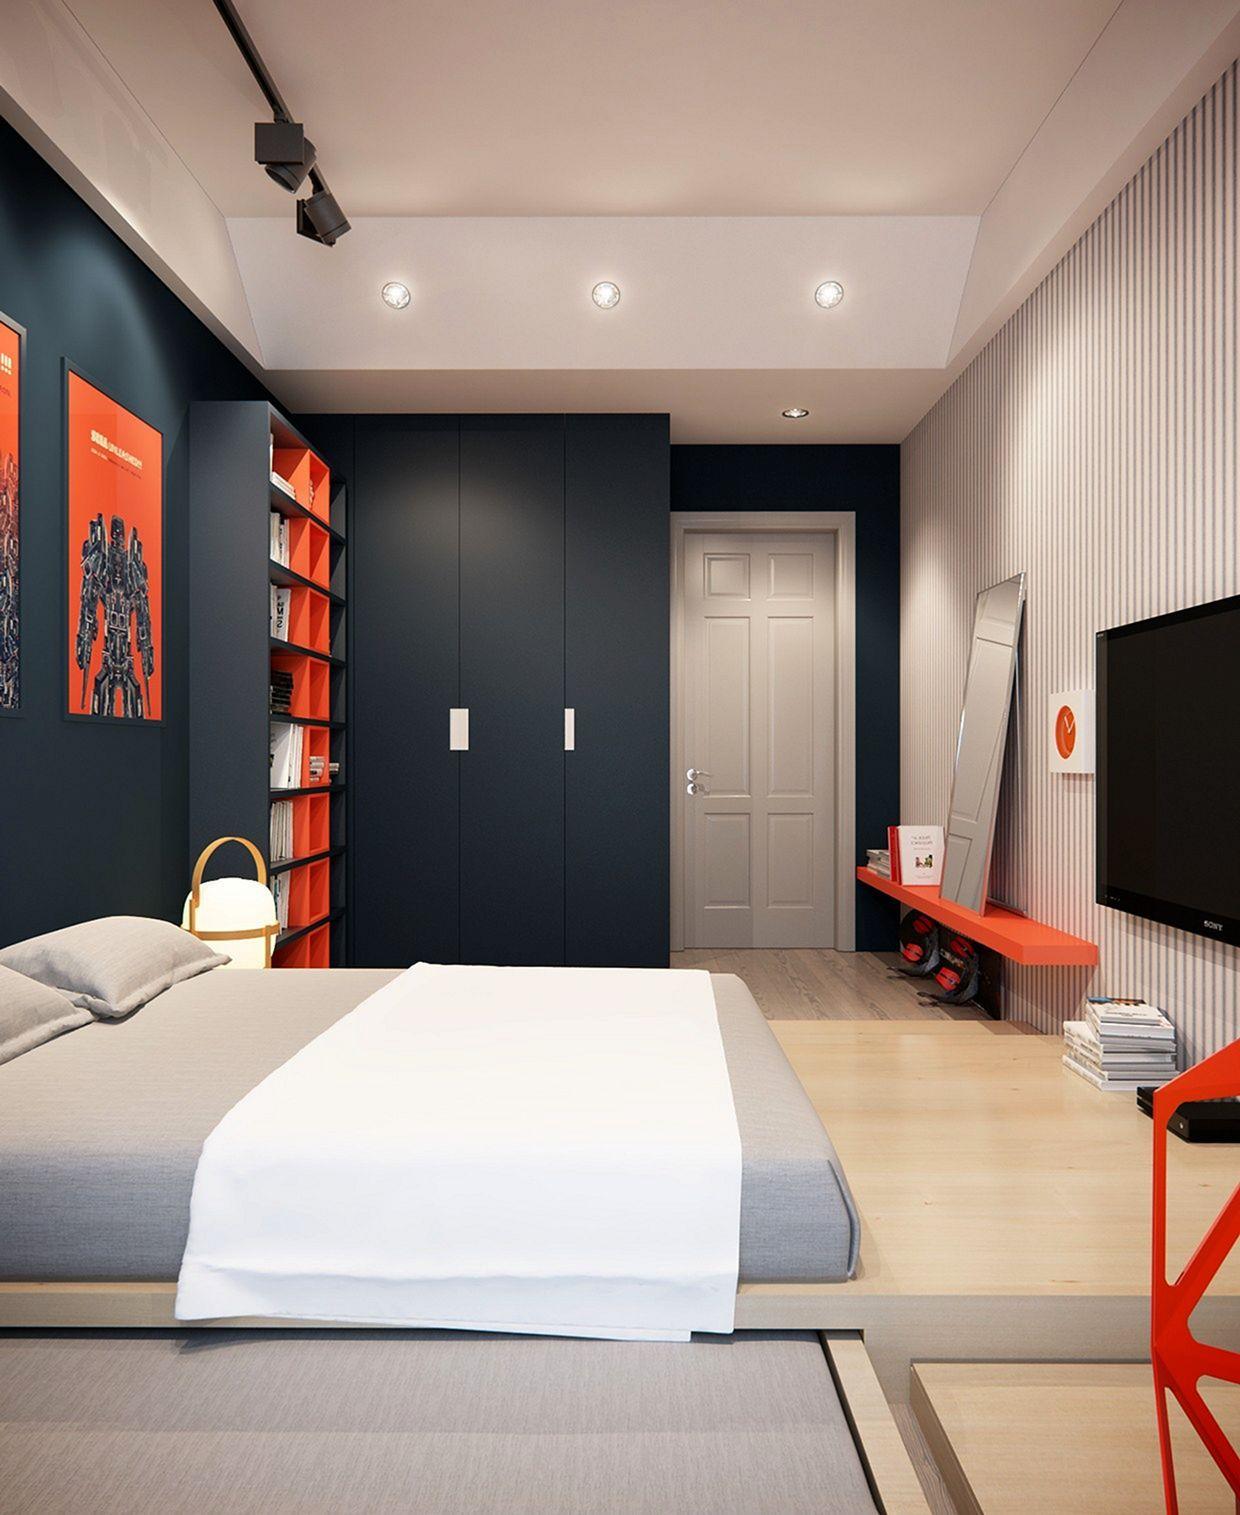 61 Best Room Decoration Ideas On A Budget Freshouz Com Boy Bedroom Design Modern Bedroom Design Bedroom Interior